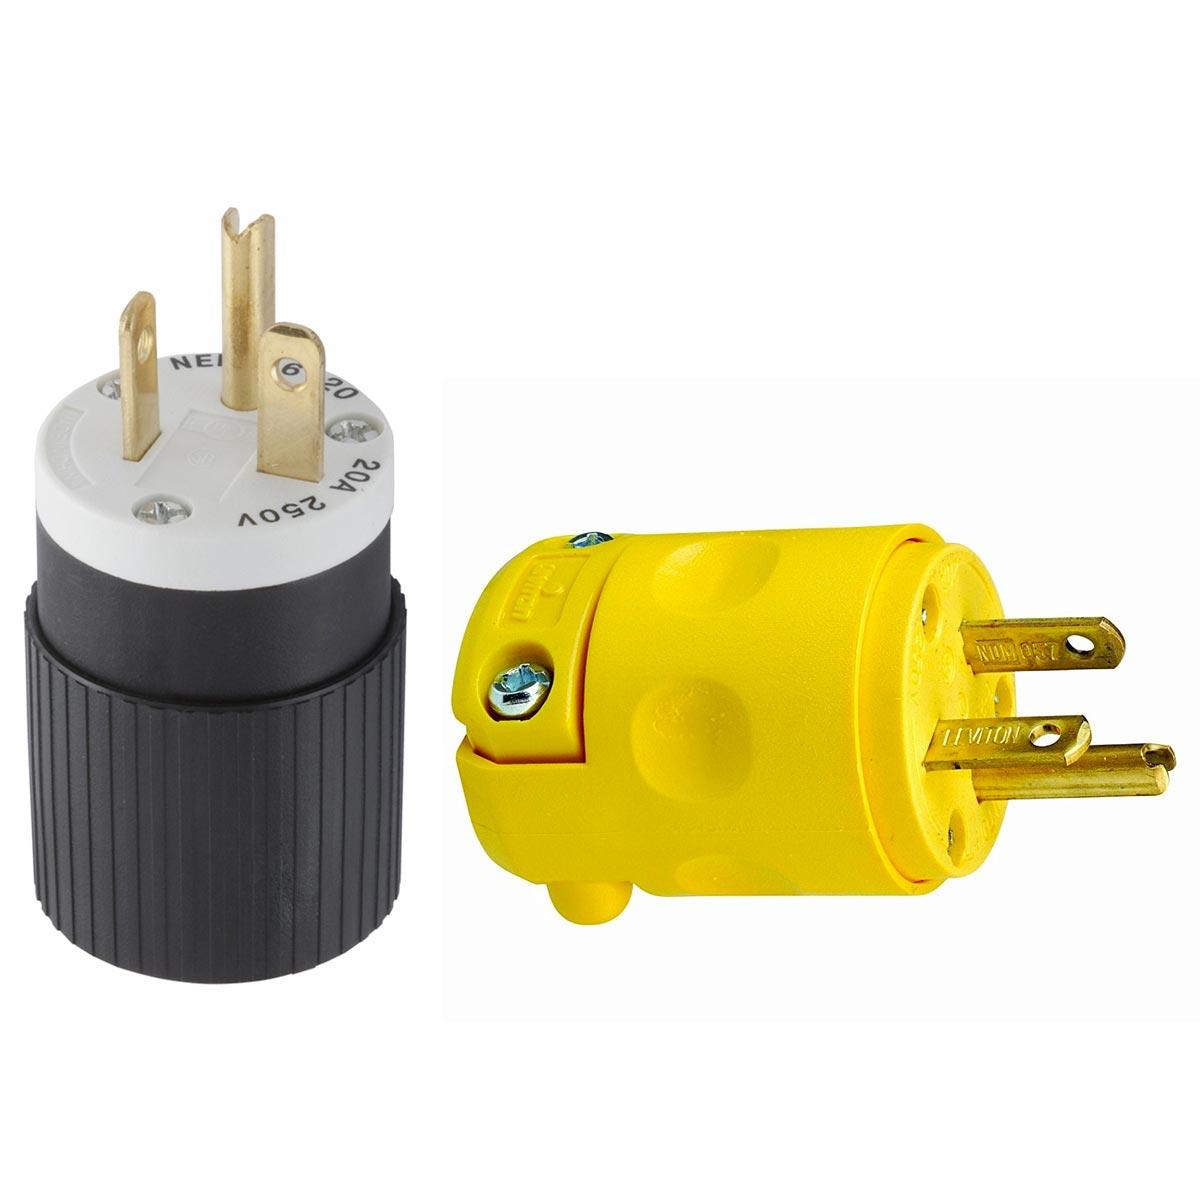 leviton 6 20p plug 20 amp 240 volt replacement end for 10. Black Bedroom Furniture Sets. Home Design Ideas